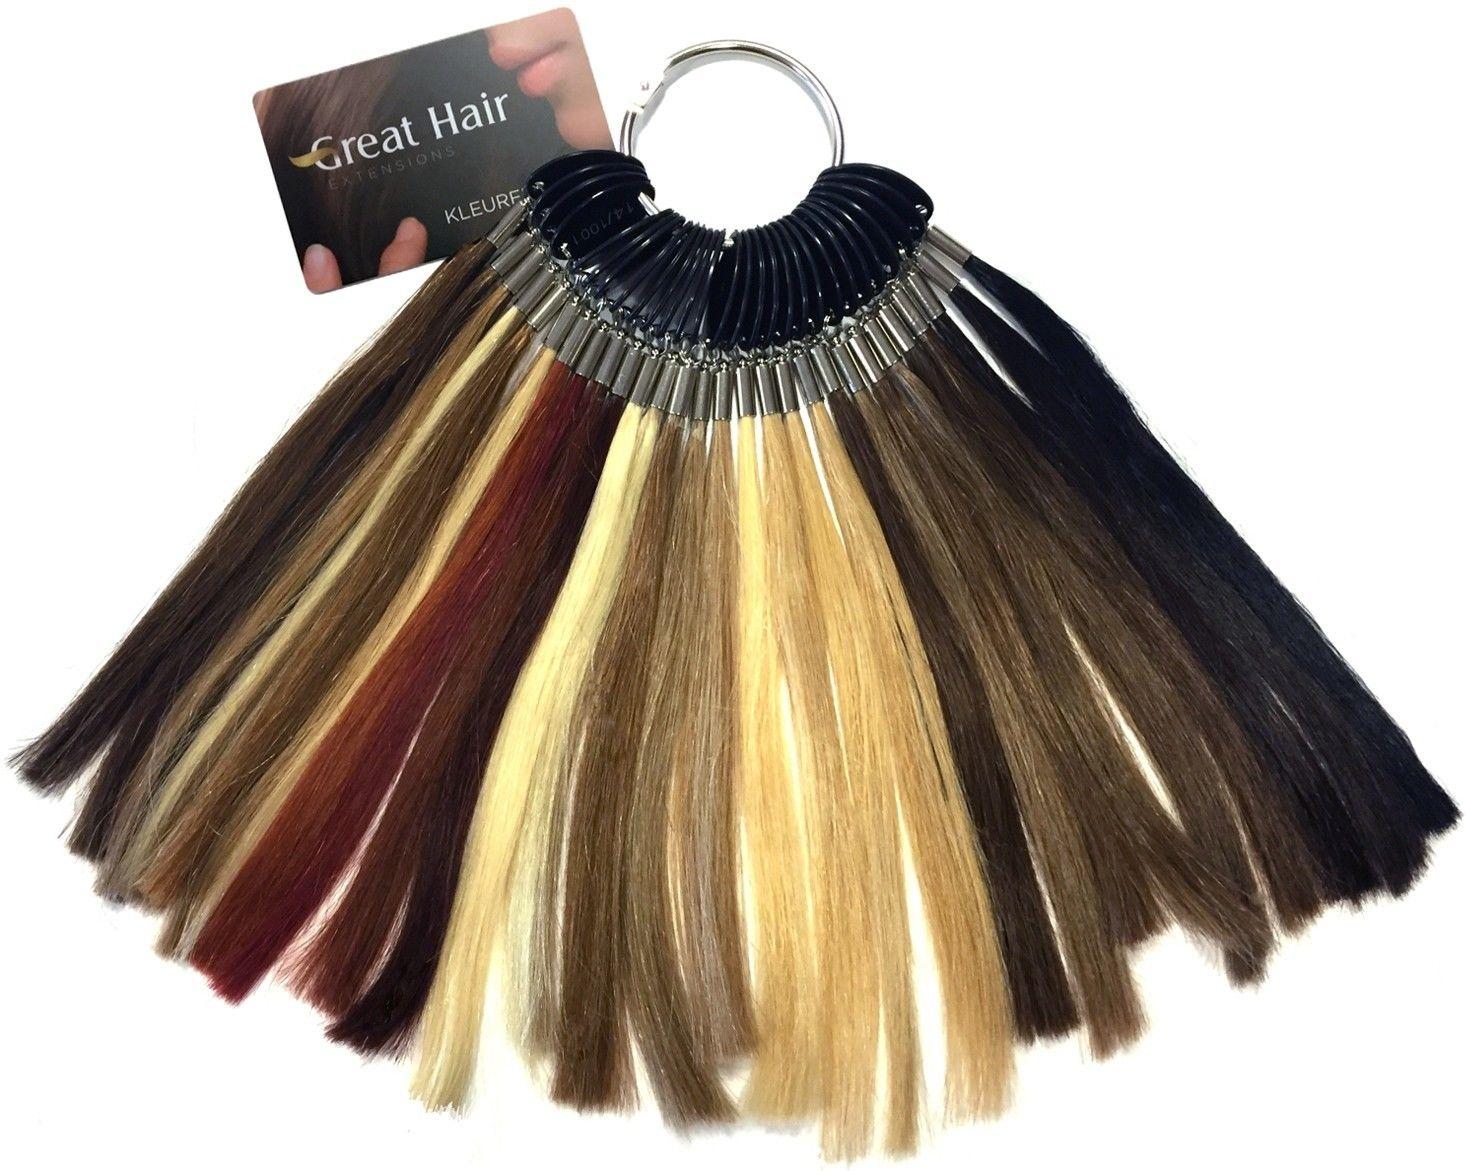 Afbeelding van Great Hair Extensions - kleurenring